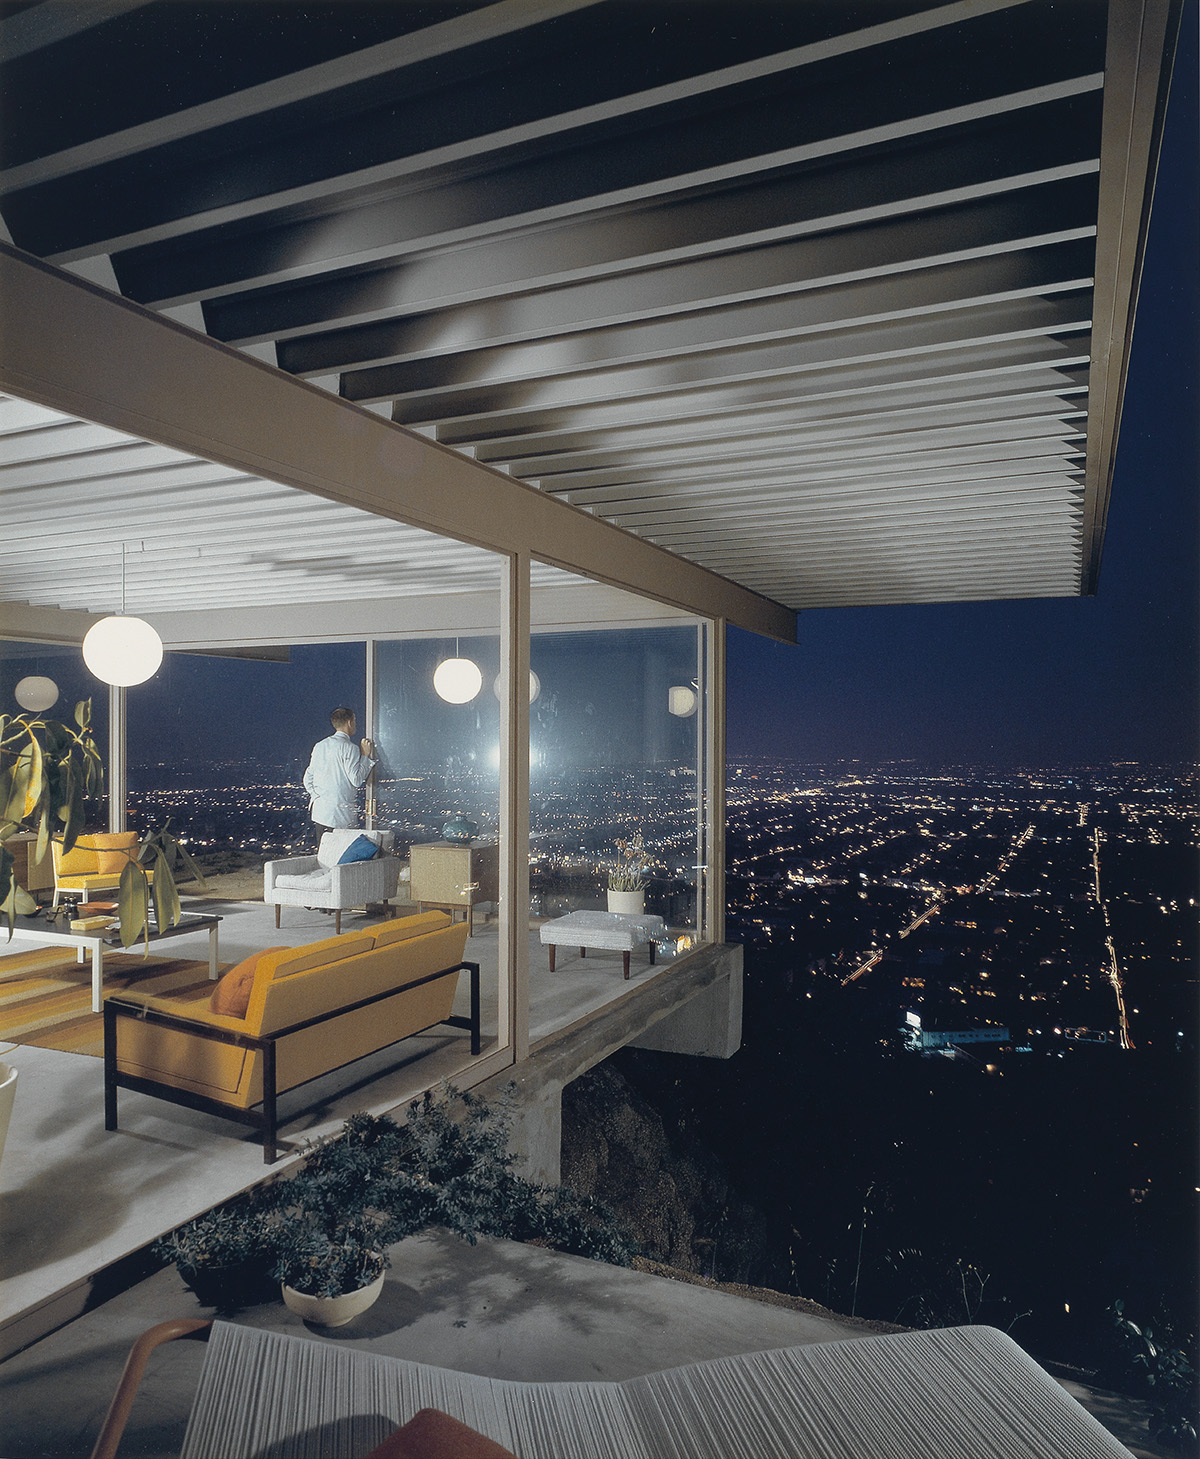 JULIUS SHULMAN (1910-2009) Los Angeles, Pierre Koening, Case Study House #22.